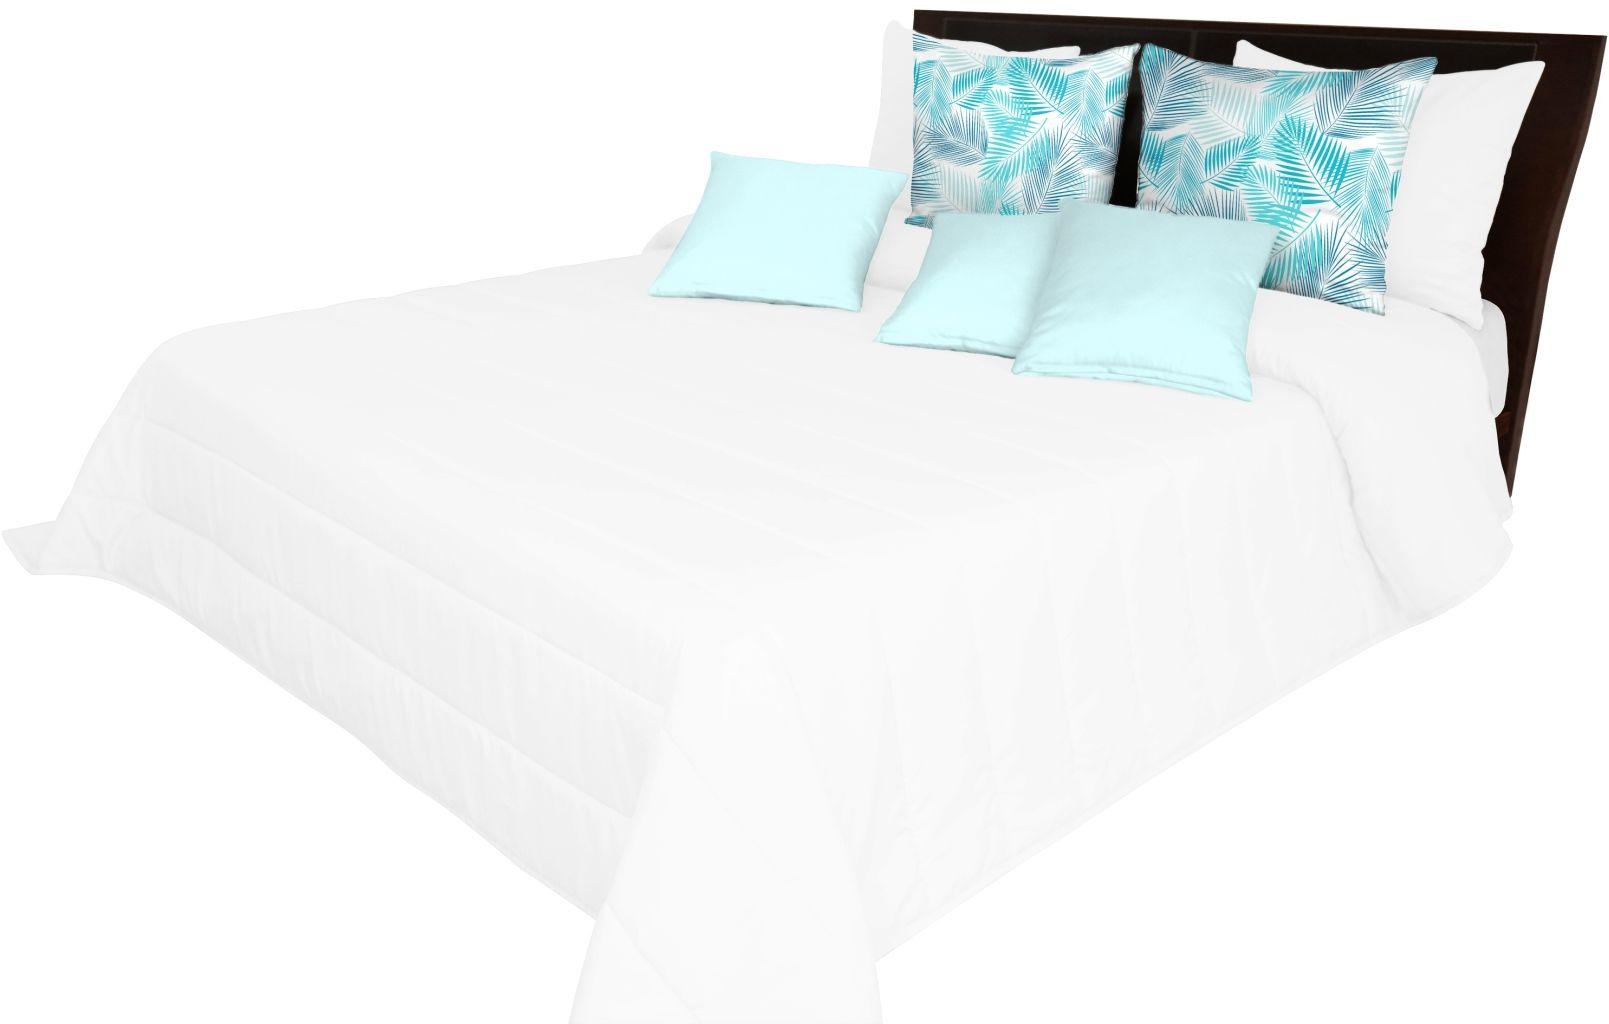 Narzuta pikowana na łóżko NMF-09 Mariall